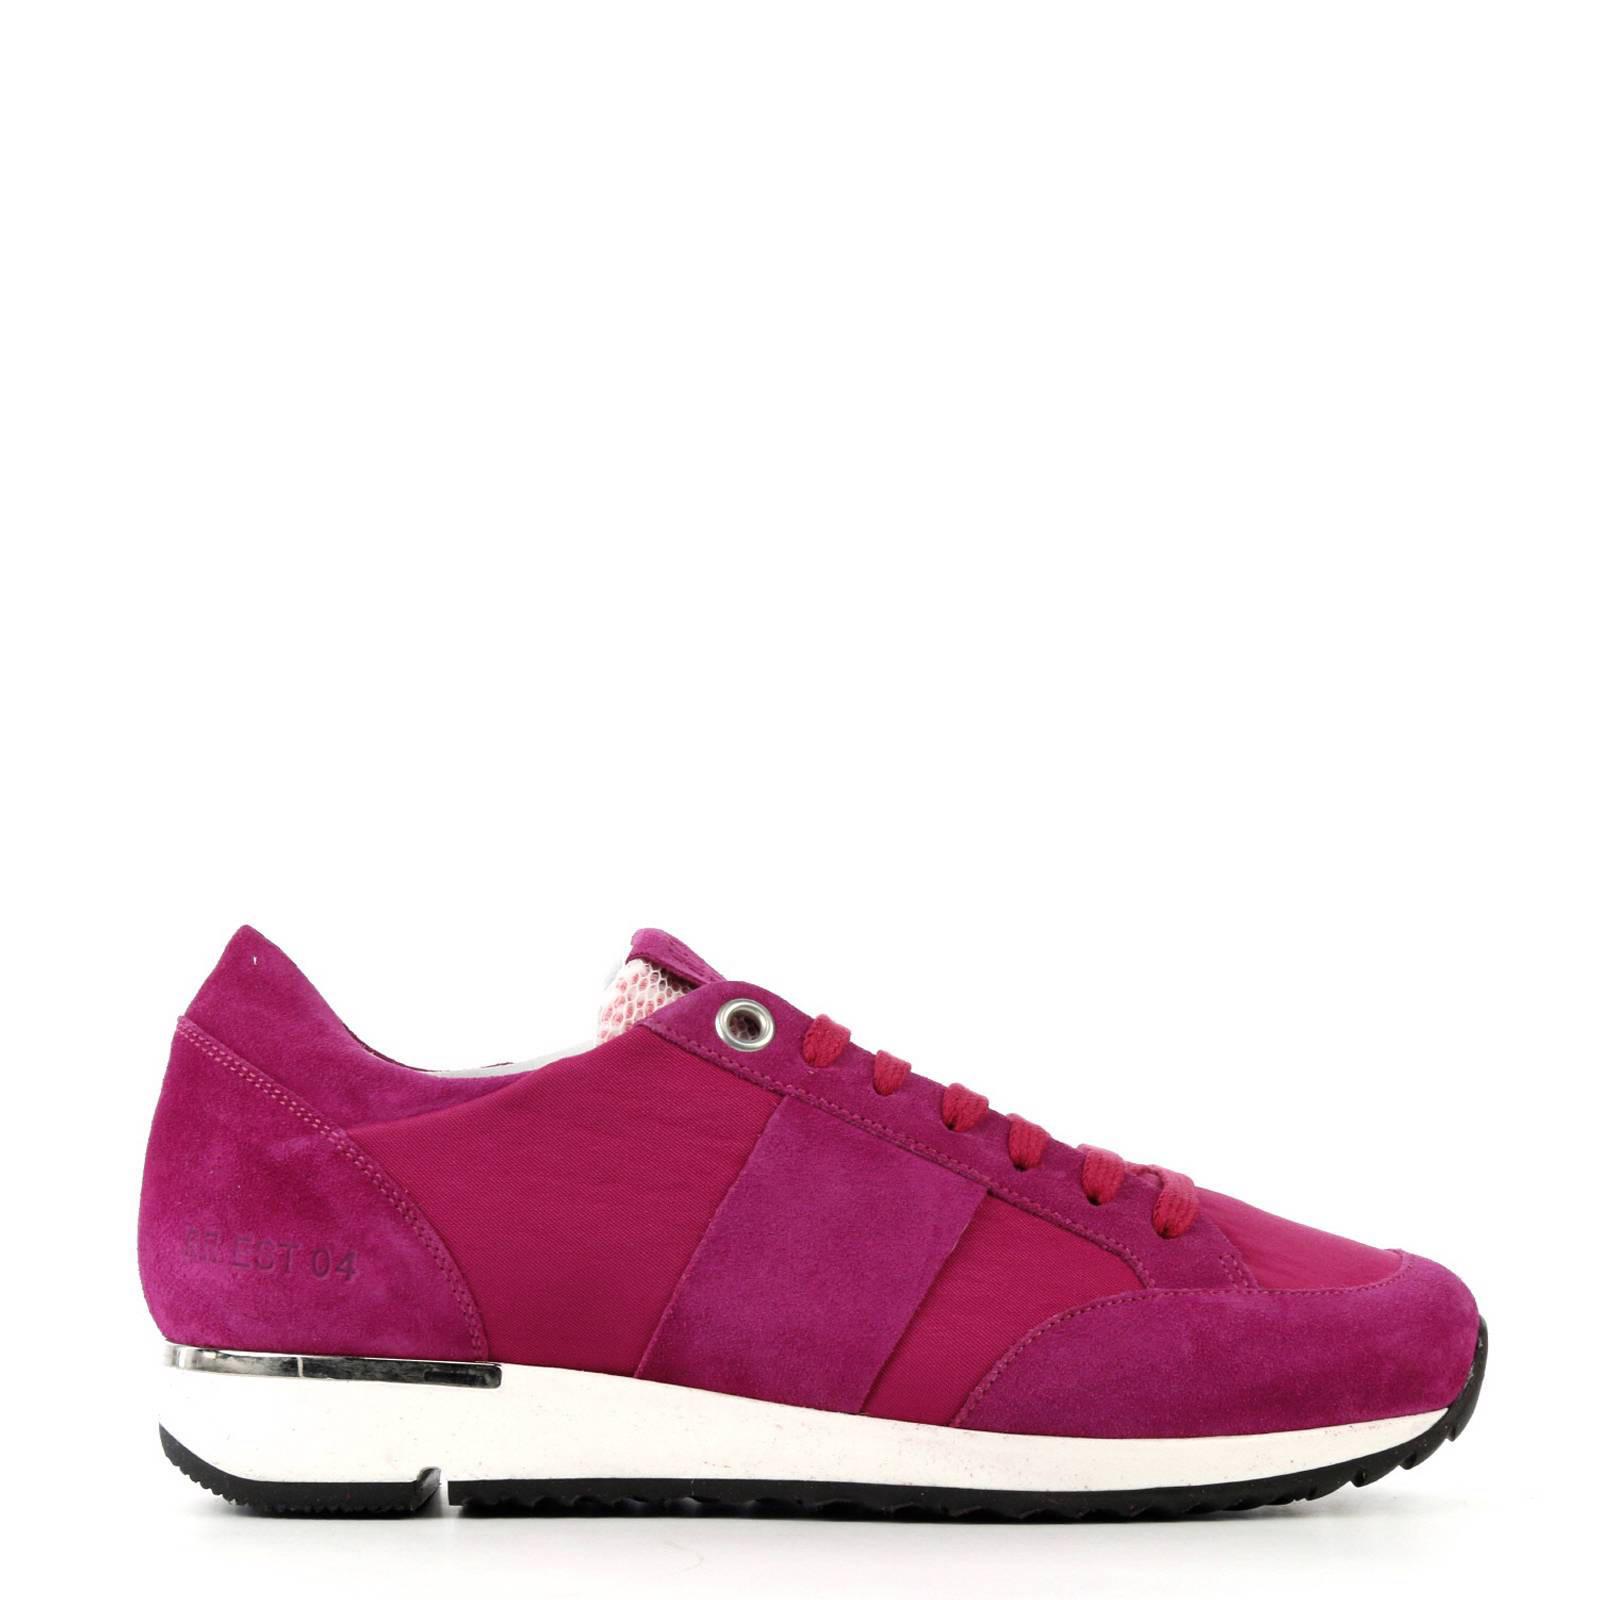 Chaussures De Sport De Chiffon Rouge Femmes (fuchsia) rMtxVW7v